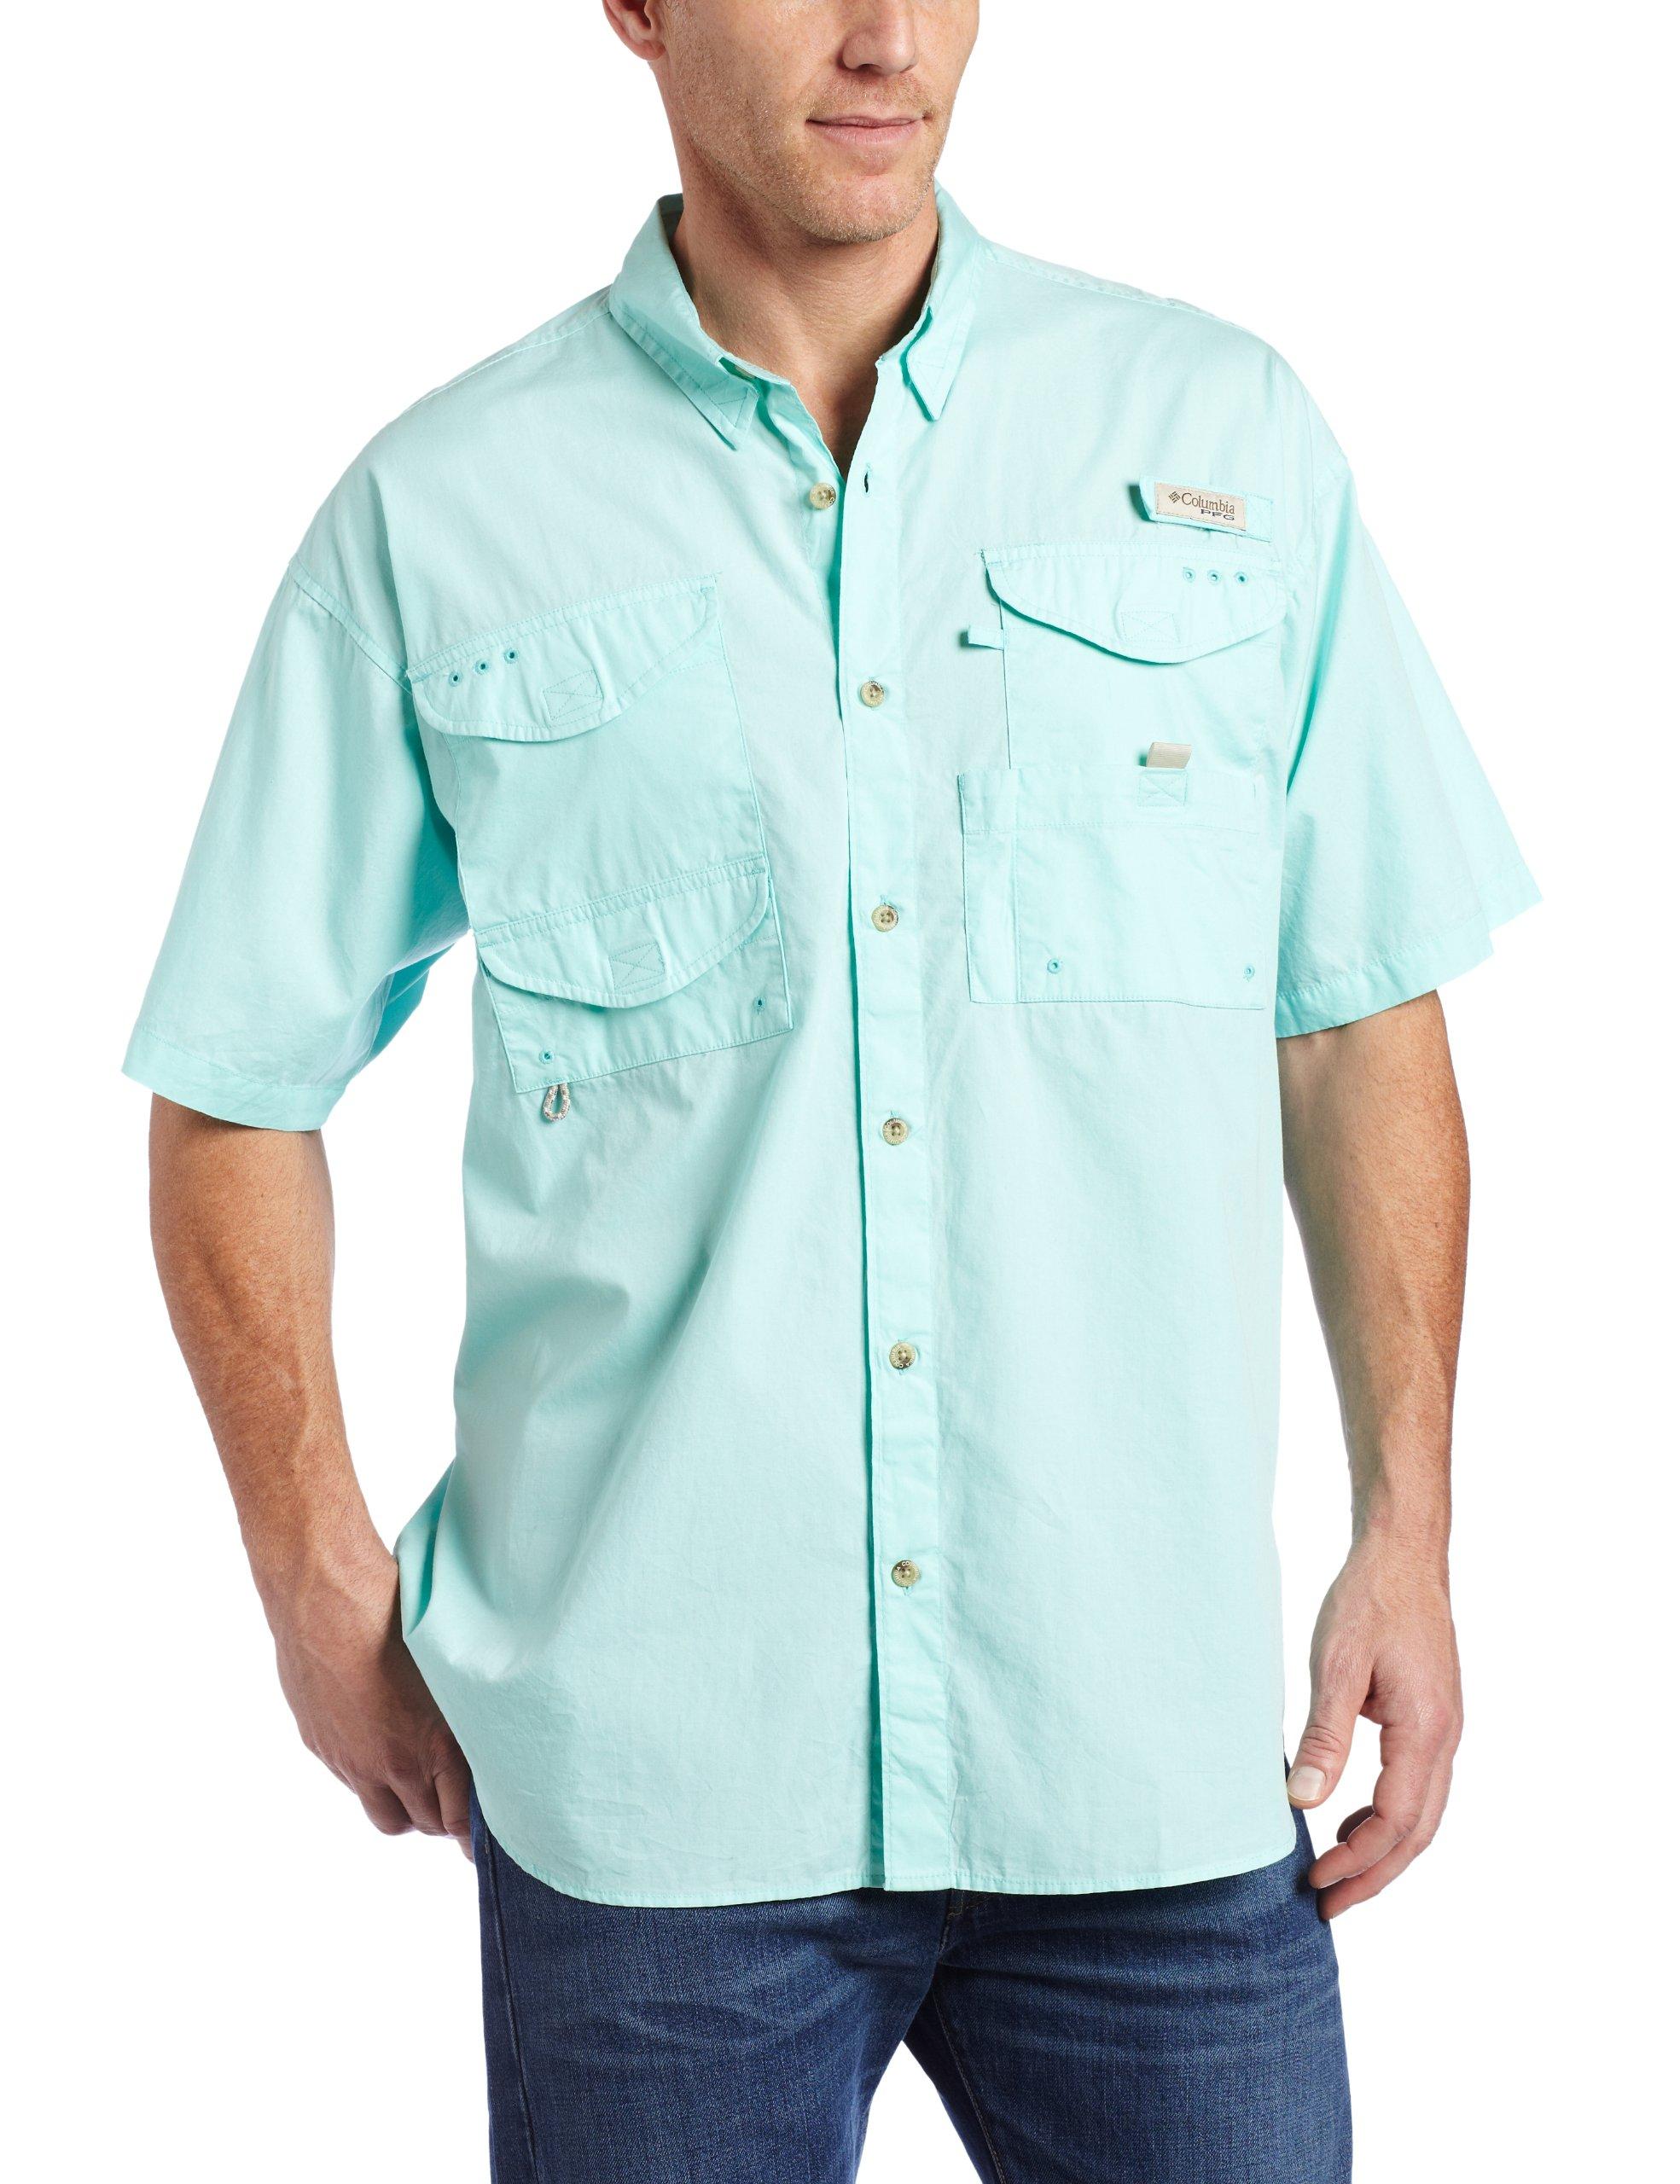 Columbia Men's Bonehead Short Sleeve Fishing Shirt (Gulf Stream, Large) by Columbia